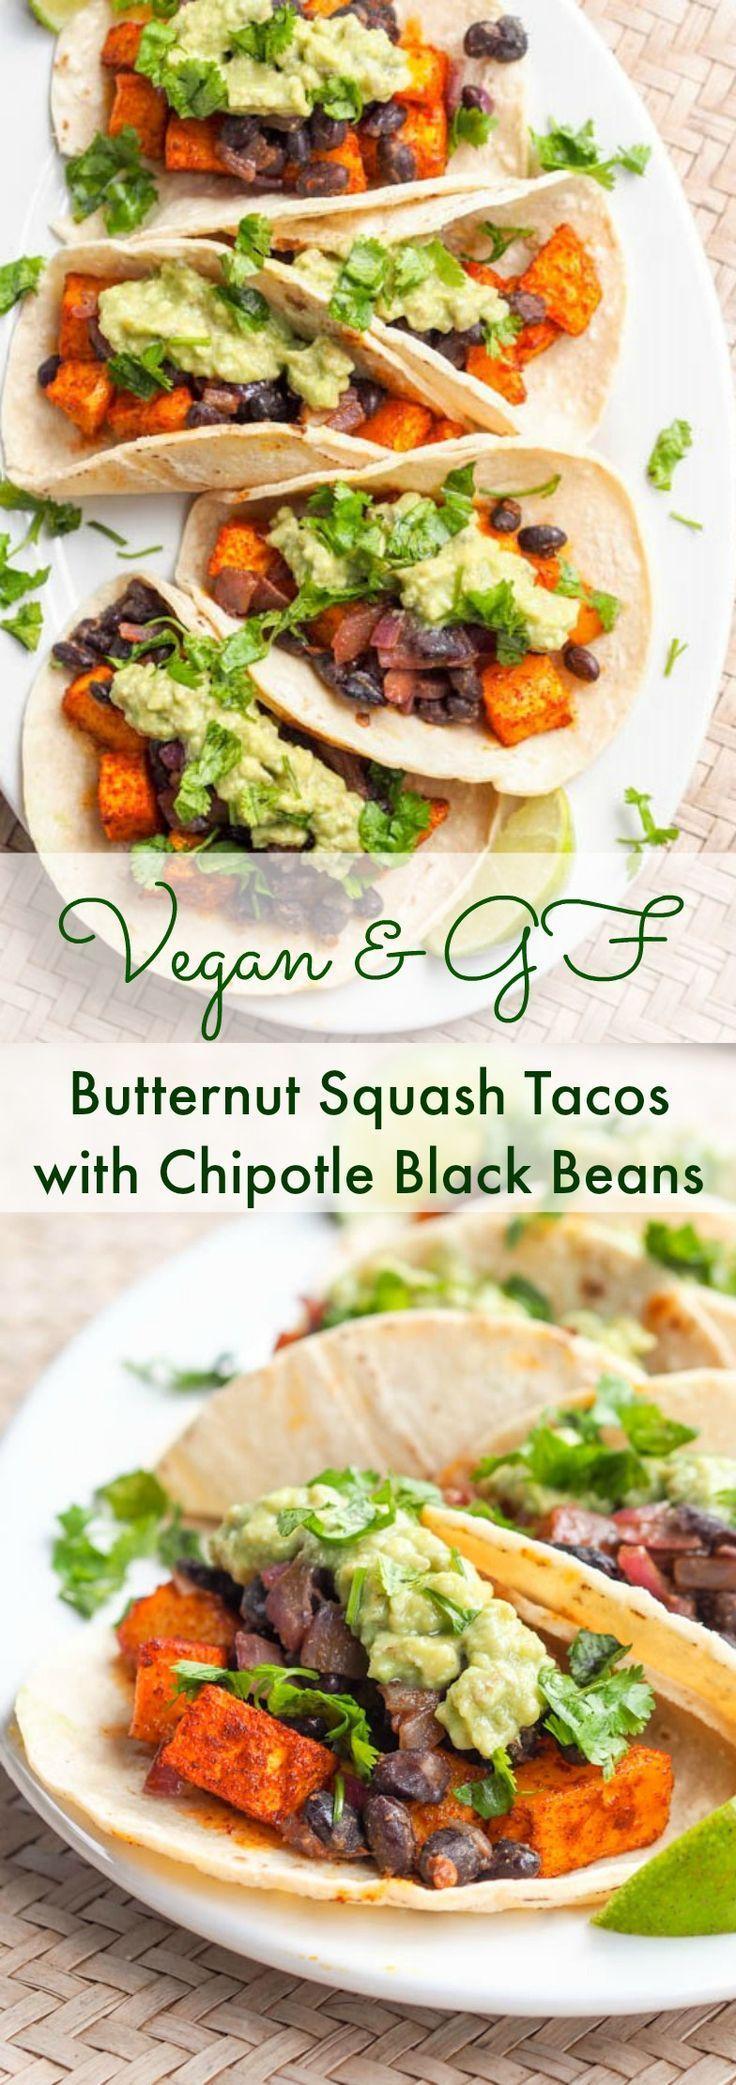 Vegan Butternut Squash Tacos With Chipotle Black Beans Gf